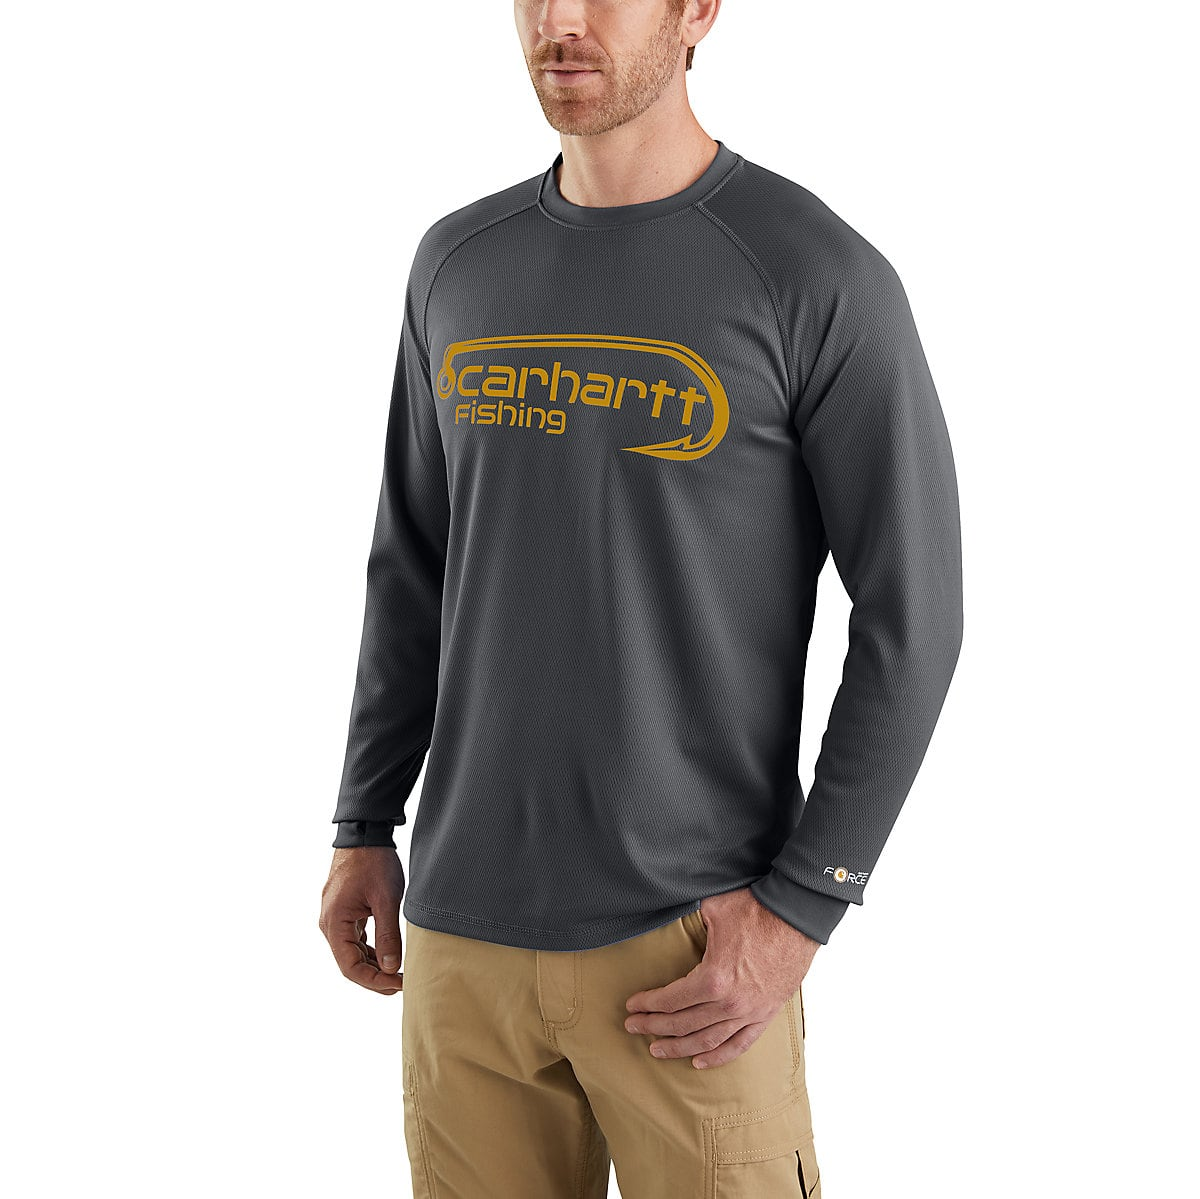 ffa7f9506 Men's Carhartt Force® Fishing Graphic Long-Sleeve T-Shirt | Carhartt